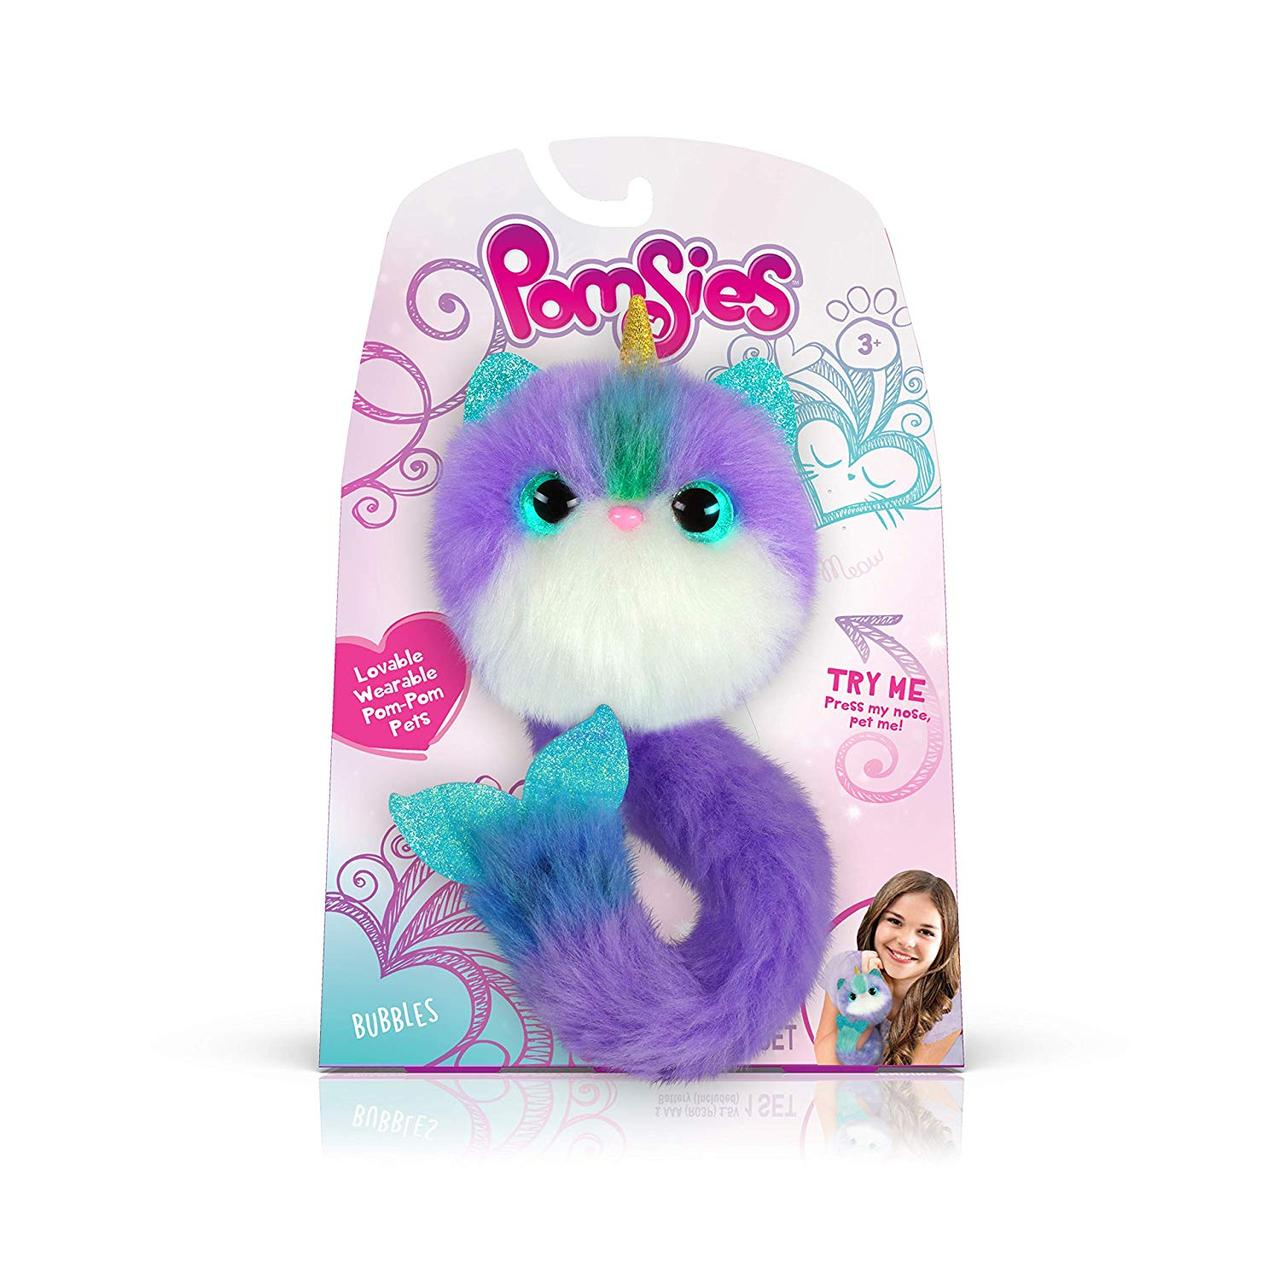 Интерактивная игрушка Нарвал Баббл Skyrocket Pomsies S4  Bubbles Оригинал 02246-B